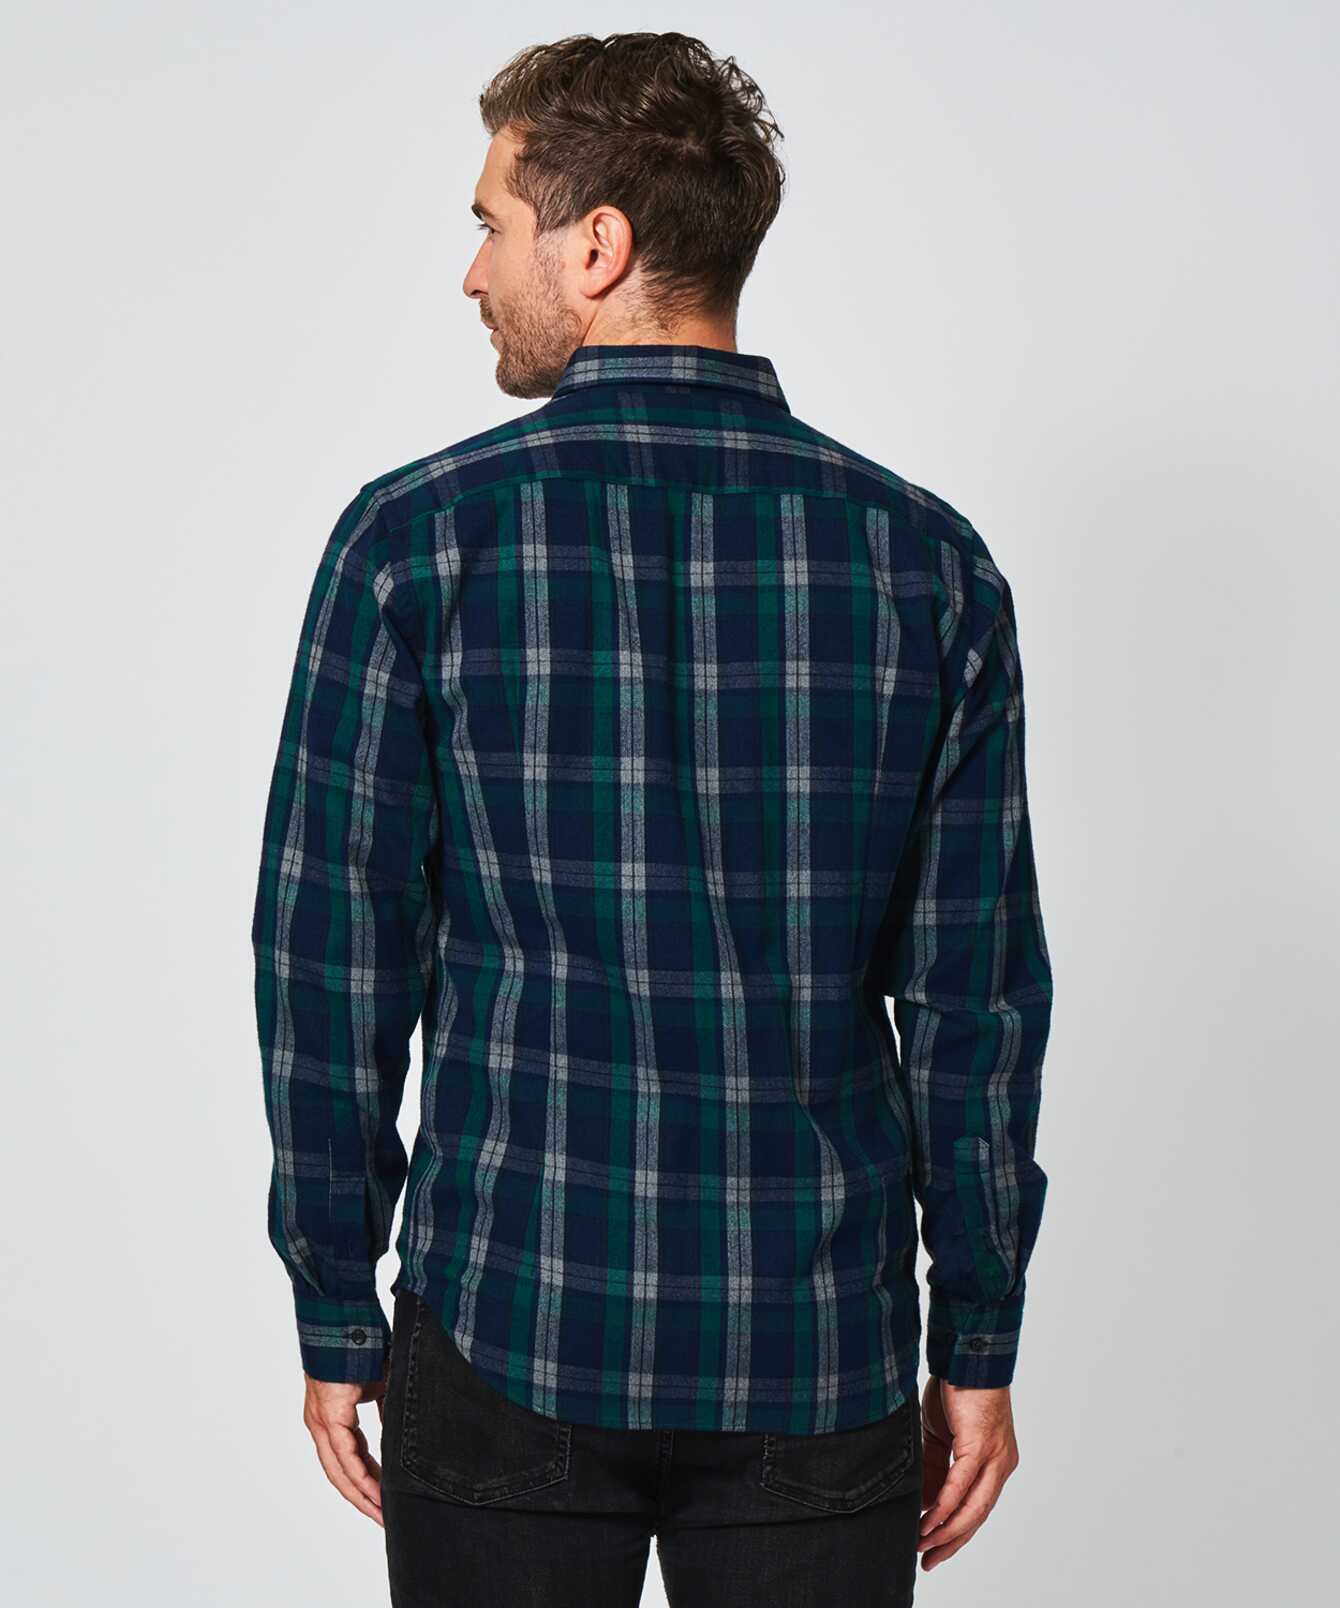 Skjorta Banff The Shirt Factory